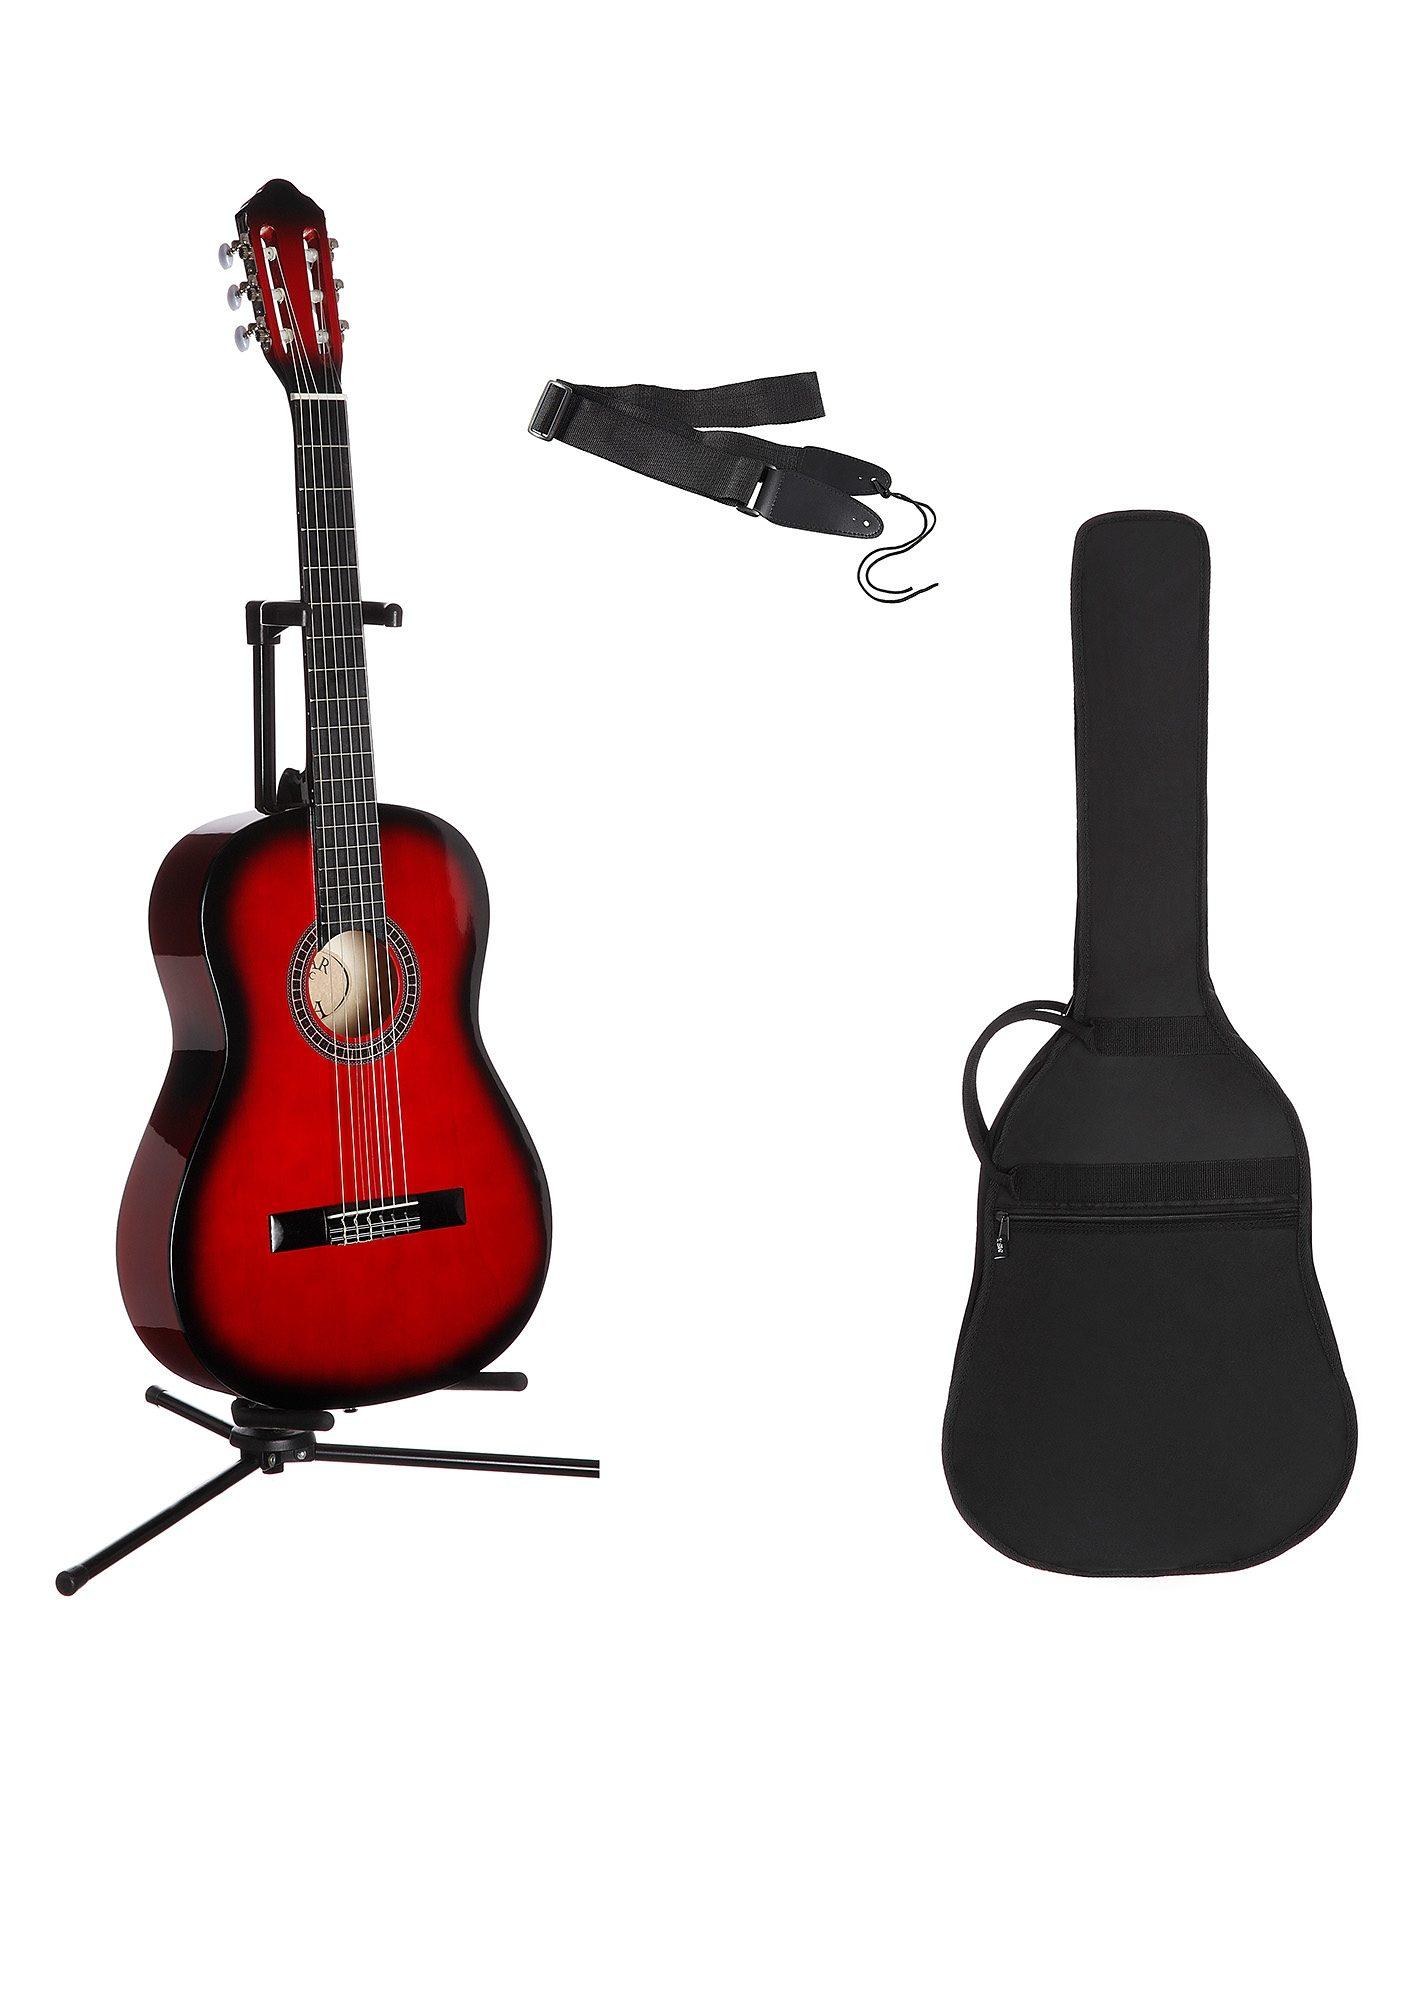 Gitarrenset Konzertgitarre, 1/4, inkl. Gitarrentasche und Gitarrengurt rot Gitarre Musikinstrumente